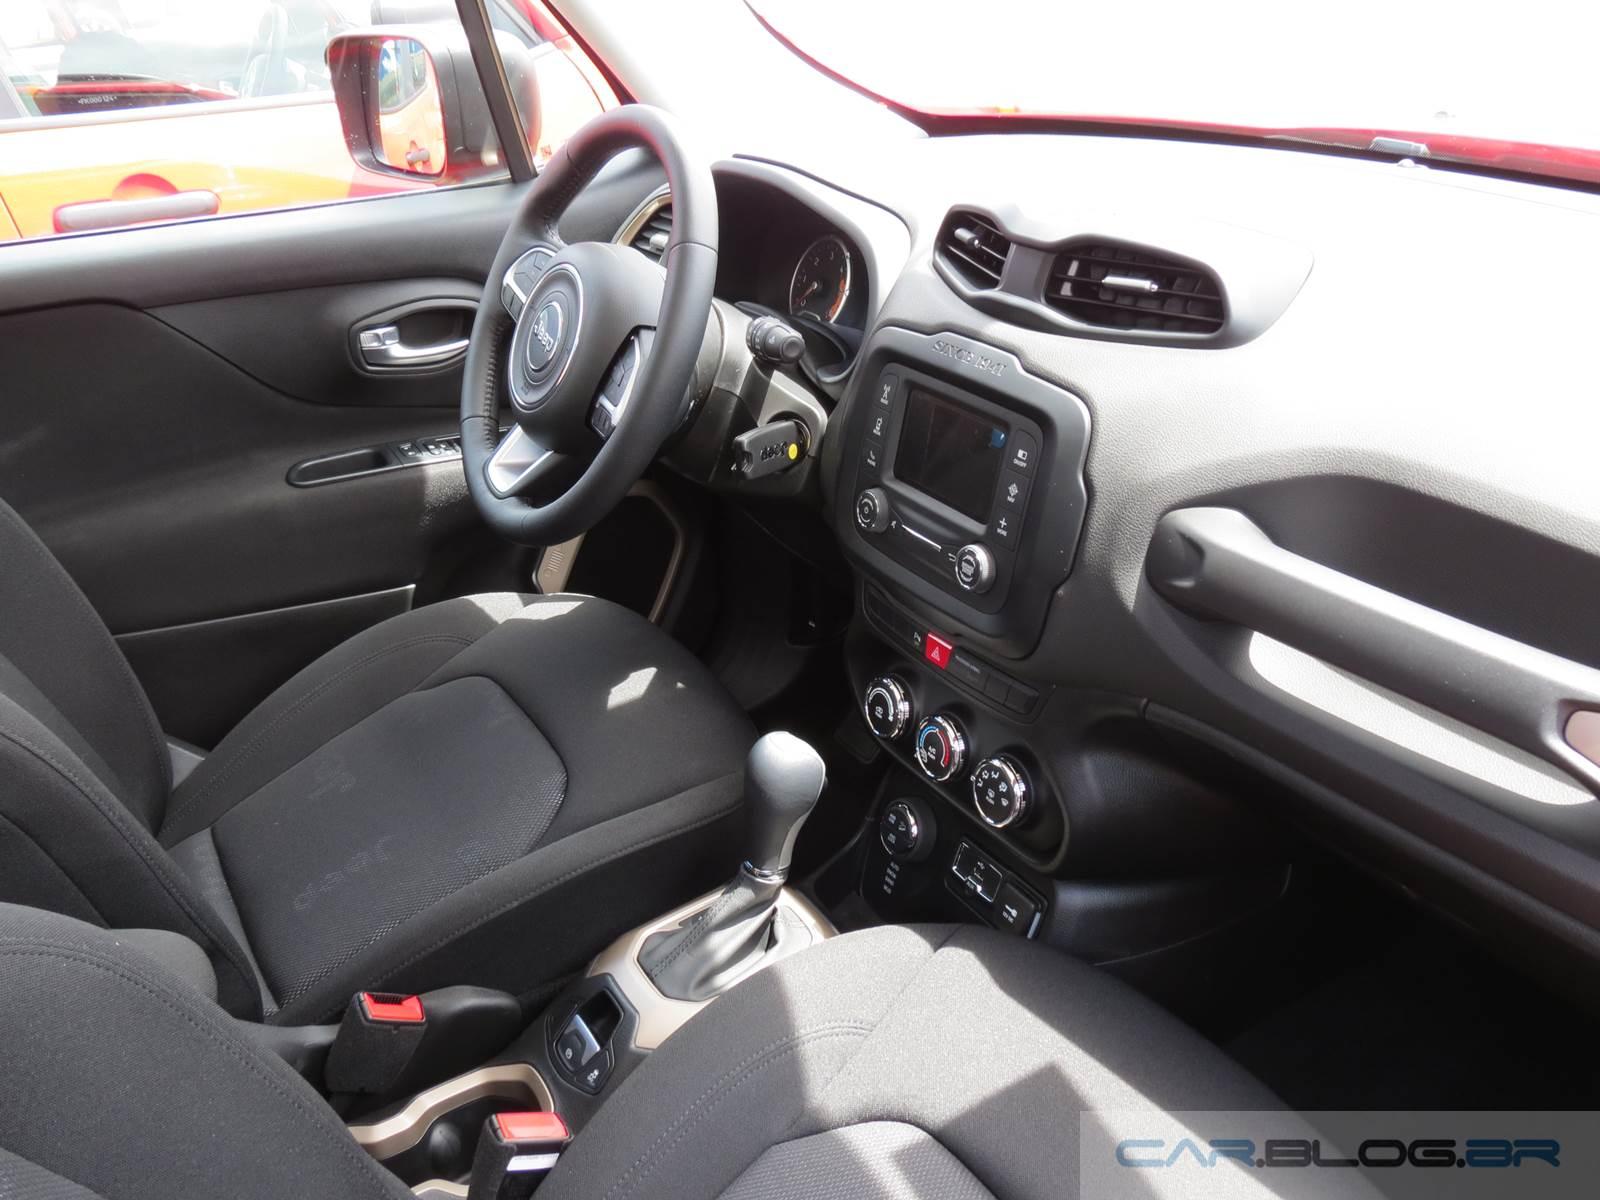 Jeep Renegade Sport 20 Diesel 4x4 Vdeo E Fotos Do